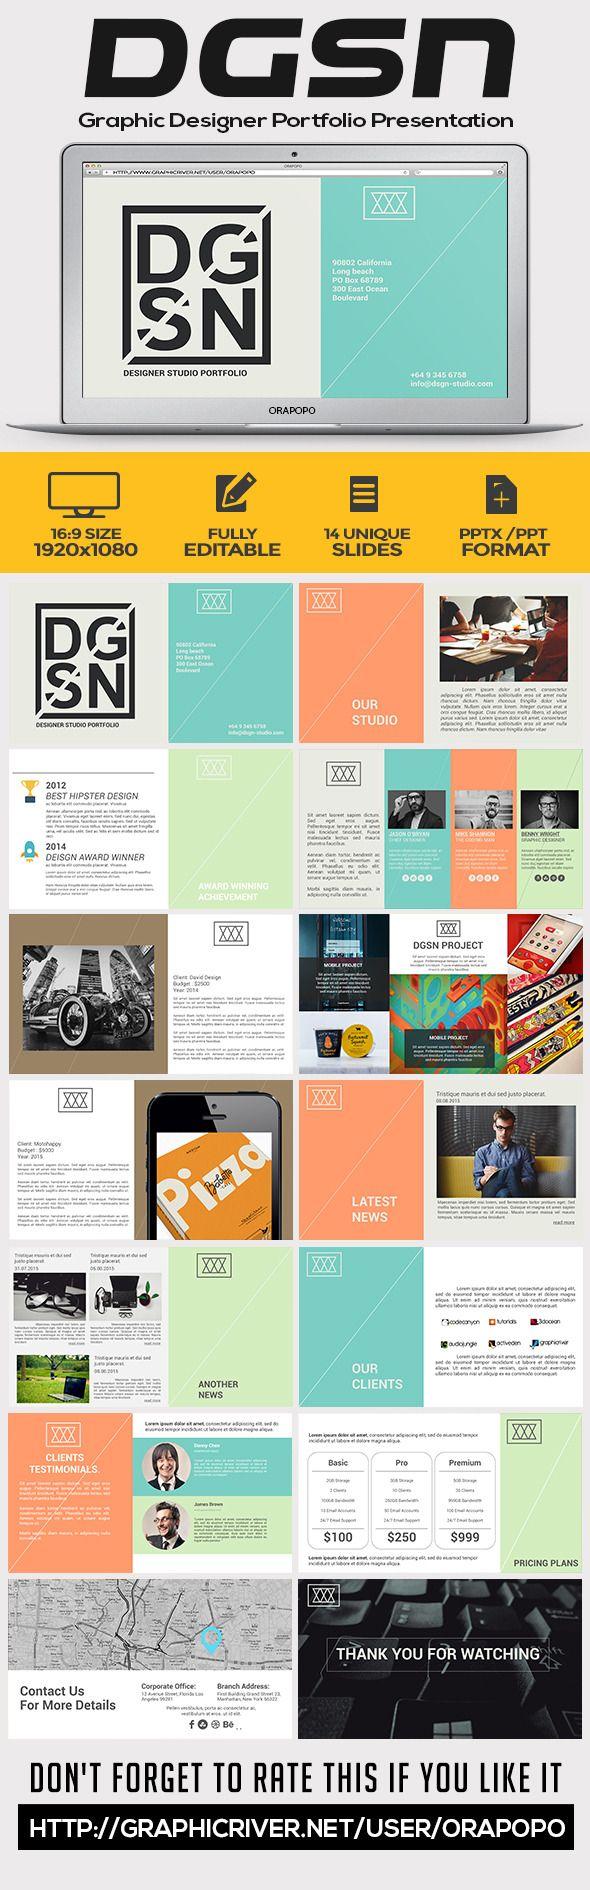 DGSN Graphic Designer Portfolio Presentation - Creative PowerPoint Templates